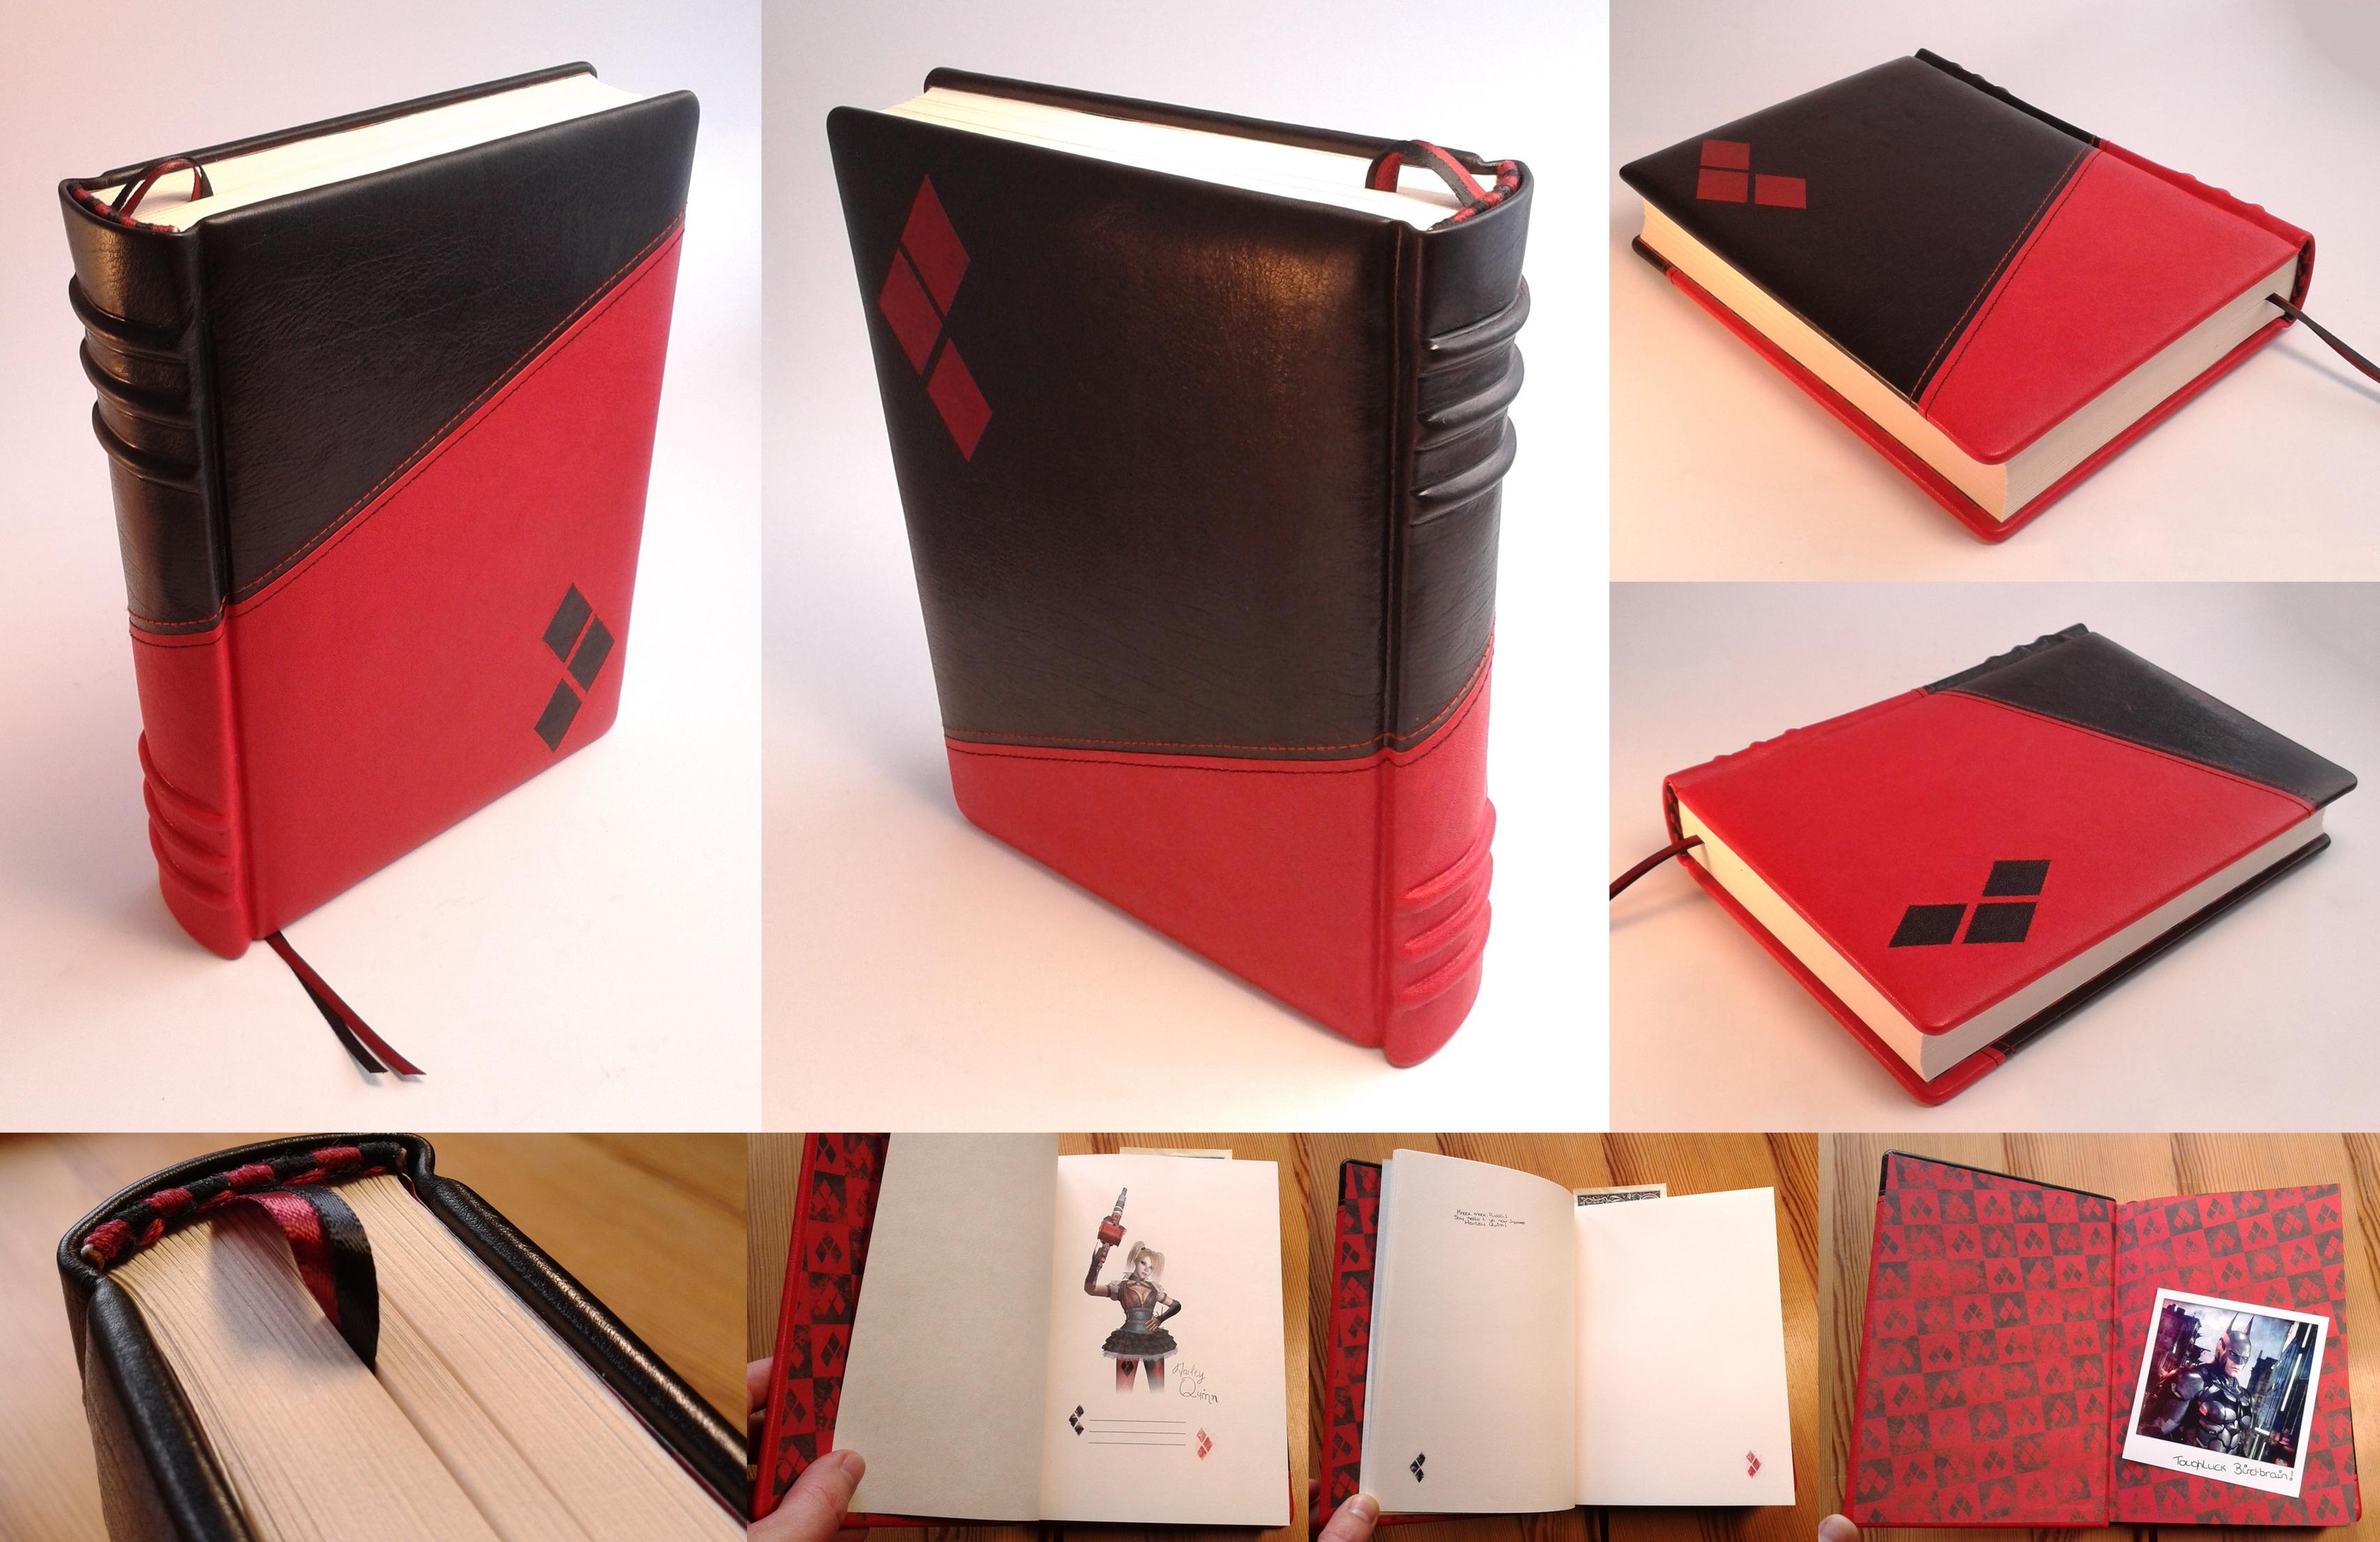 Harley quinn 39 s notebook by vanyanie on deviantart - Deadpool harley quinn notebook ...